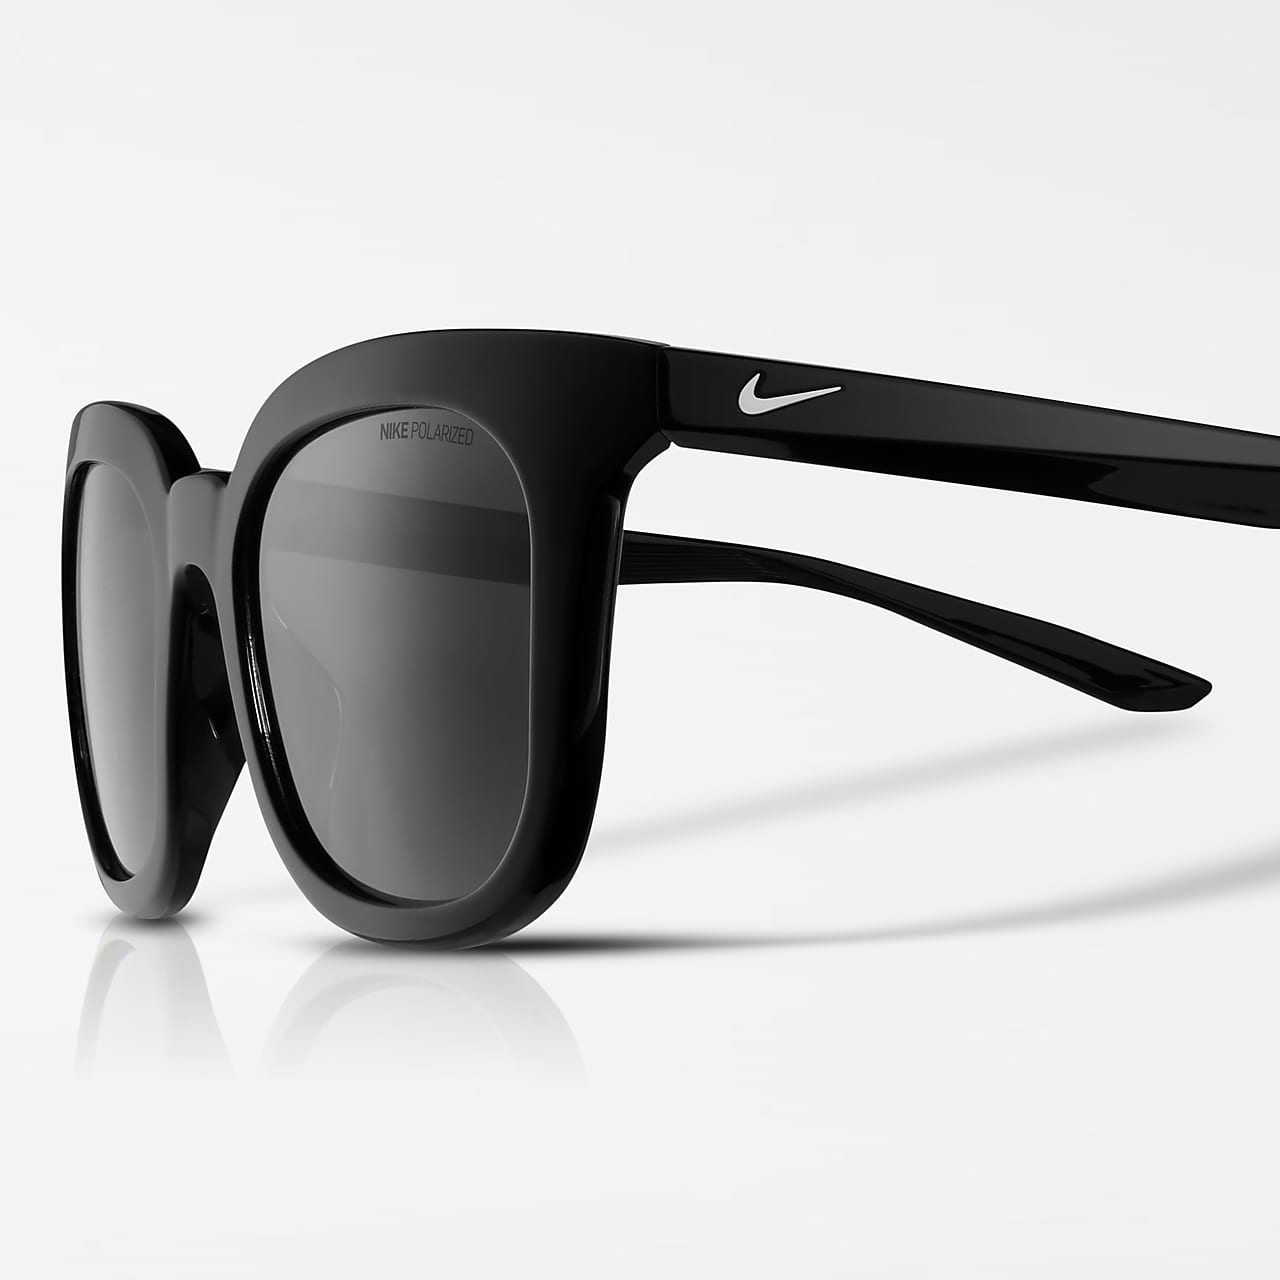 Nike Myriad Polarized Sunglasses